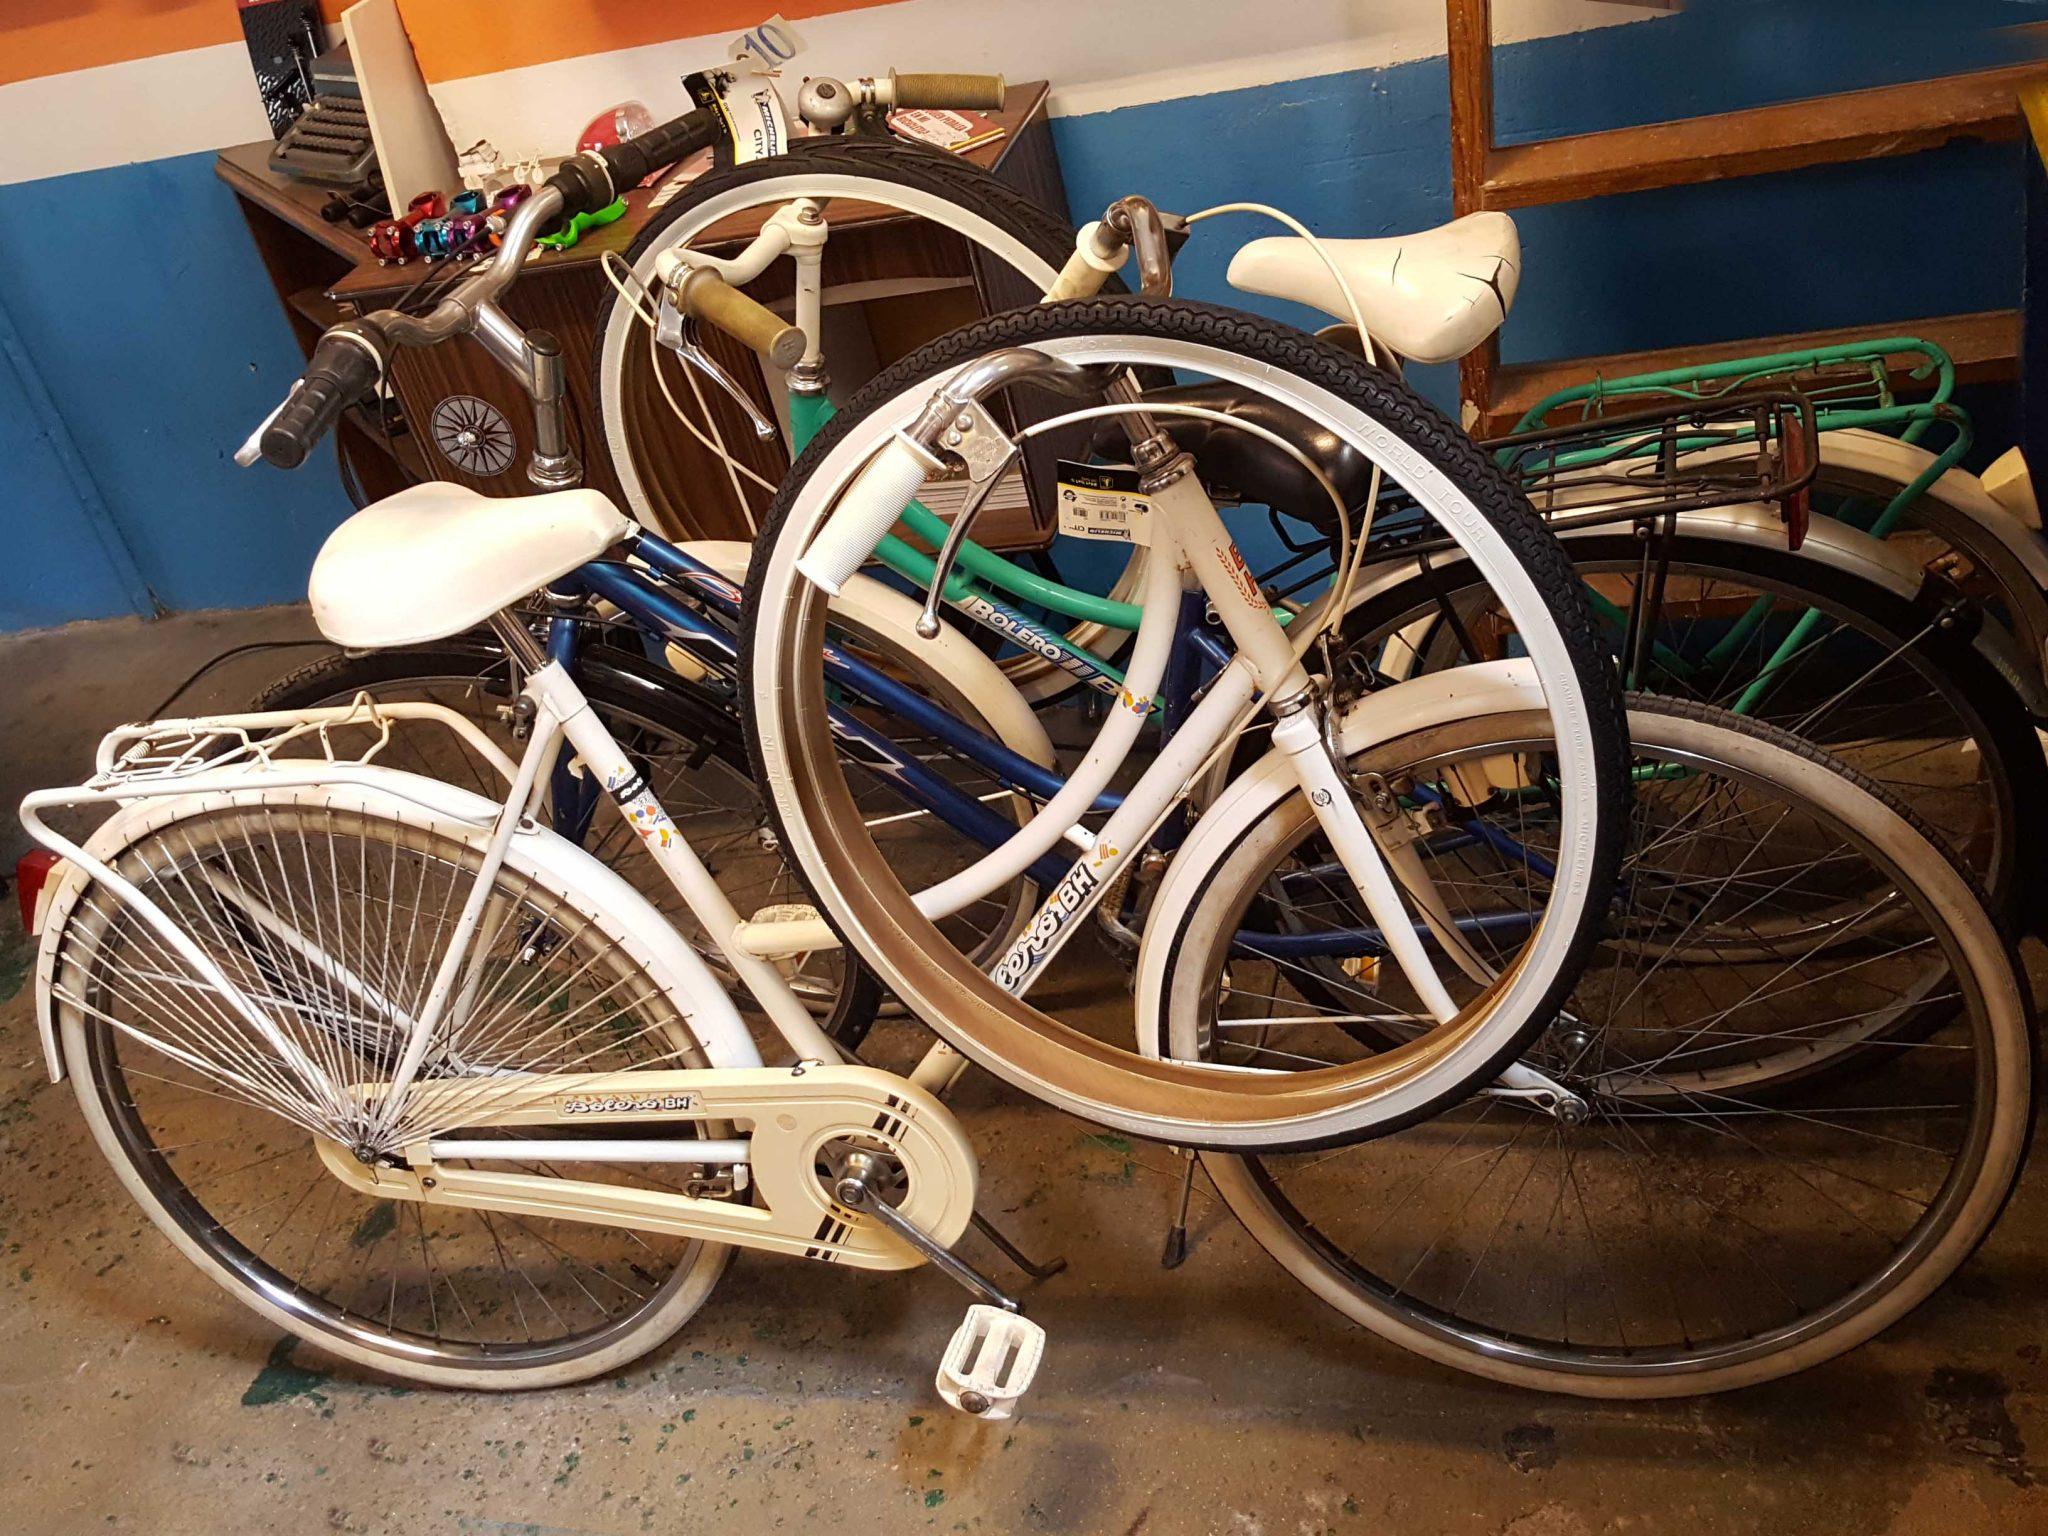 Los Martínez Banco de bicis Alquiler bicicletas especiales Ana Belén Portugal Cascais